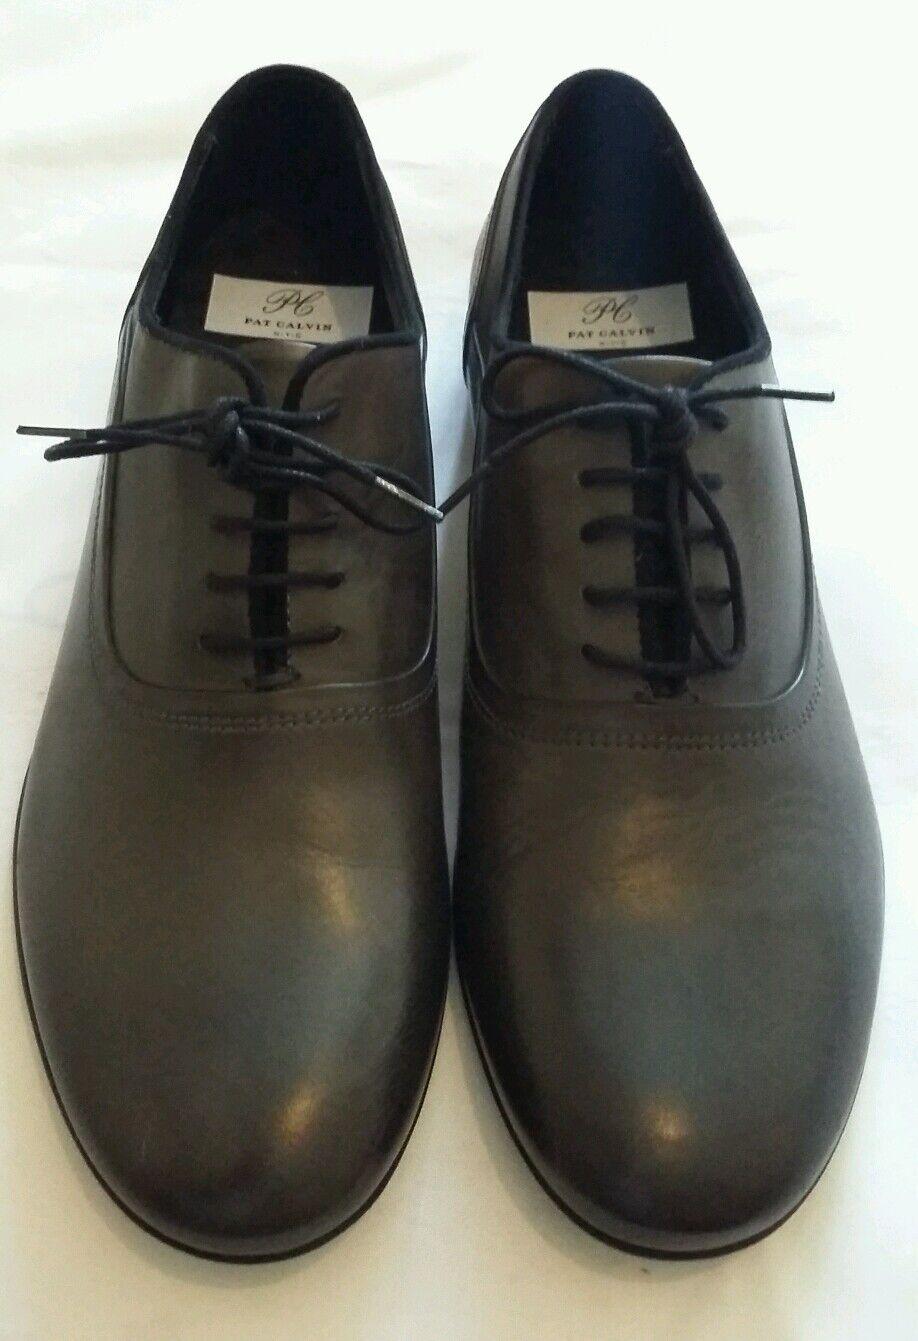 PAT CALVIN Up N.Y.C Dark Grey Lace Up CALVIN Shoe Size uk 7 eu 41 a9cb6a